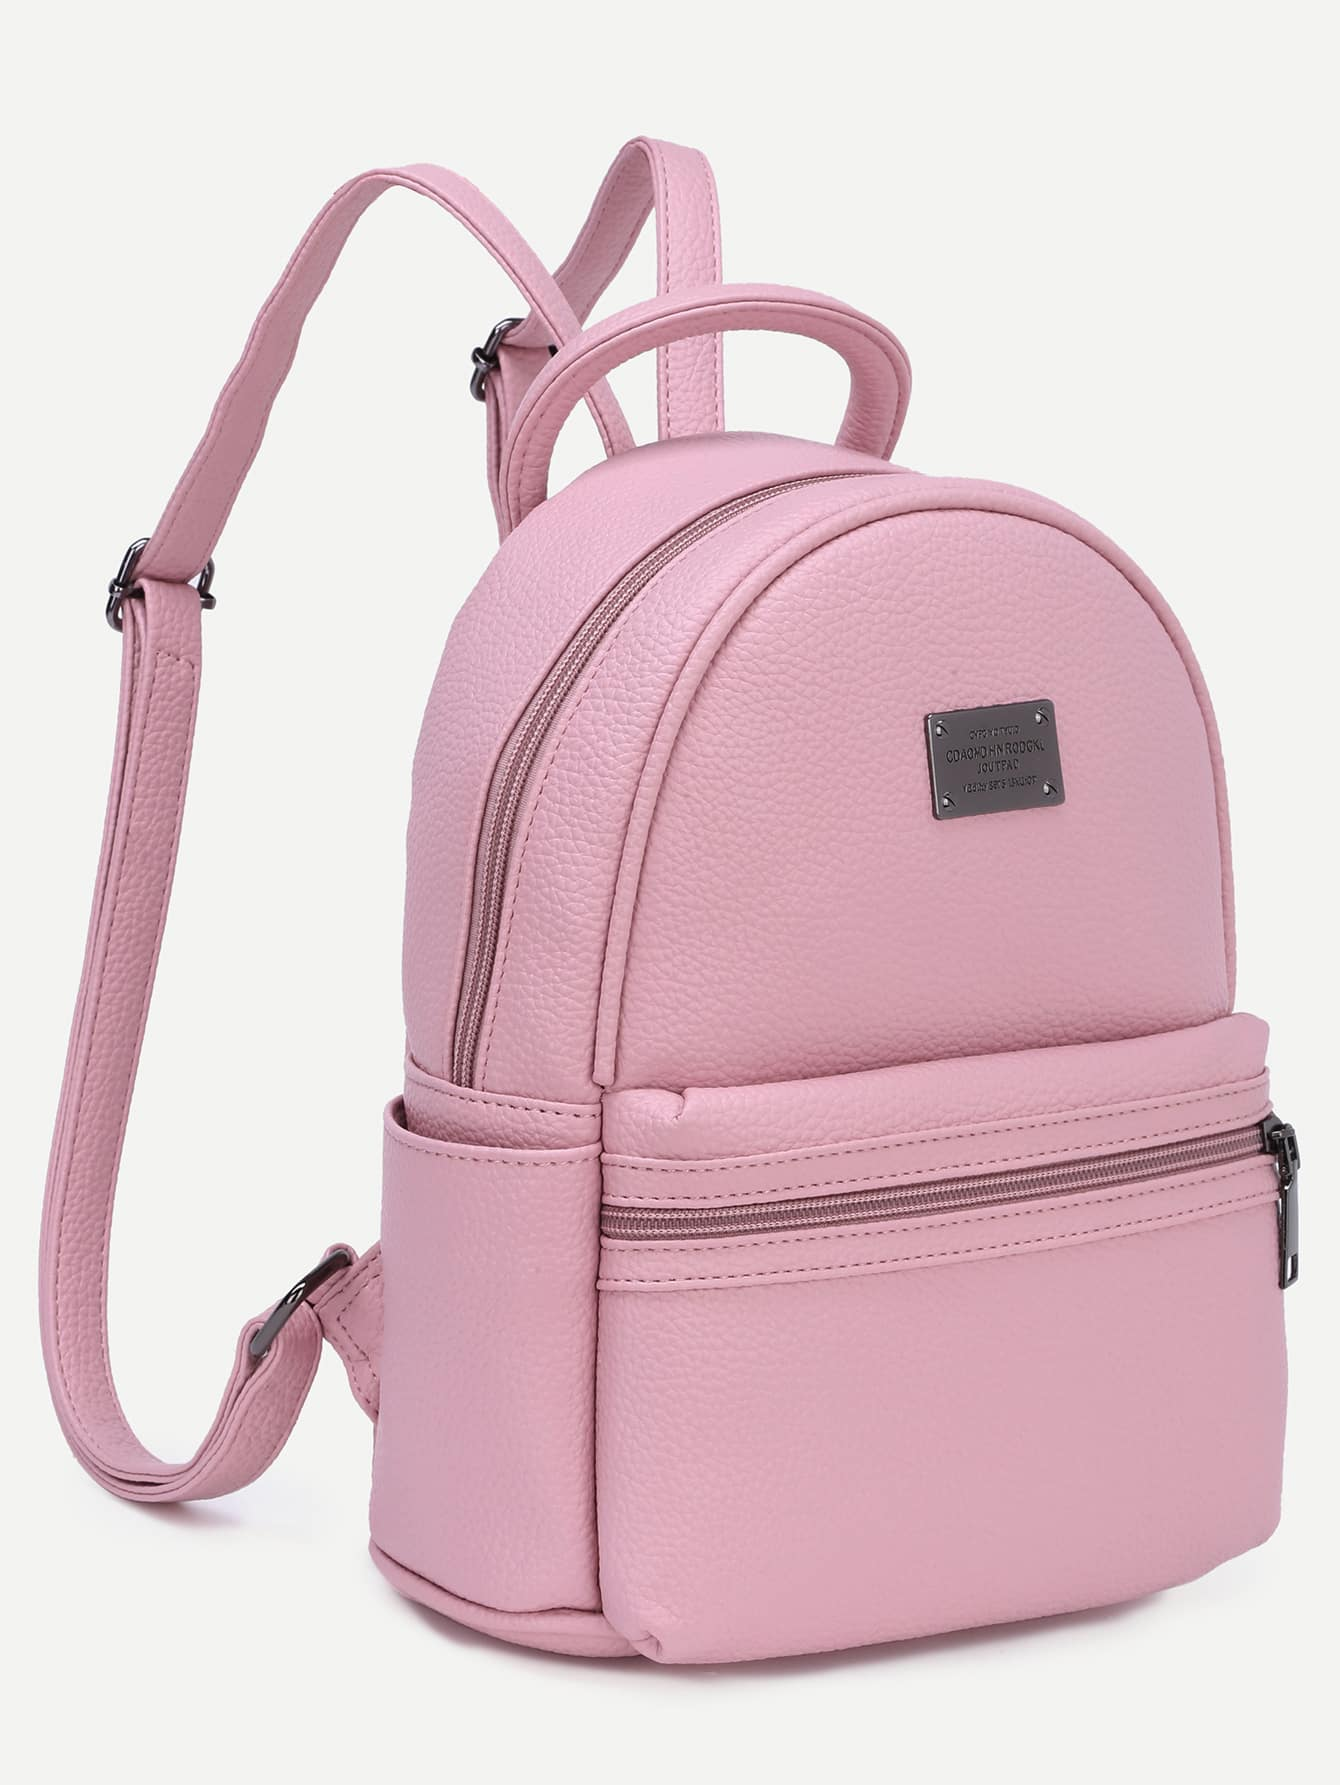 bag160817909_2